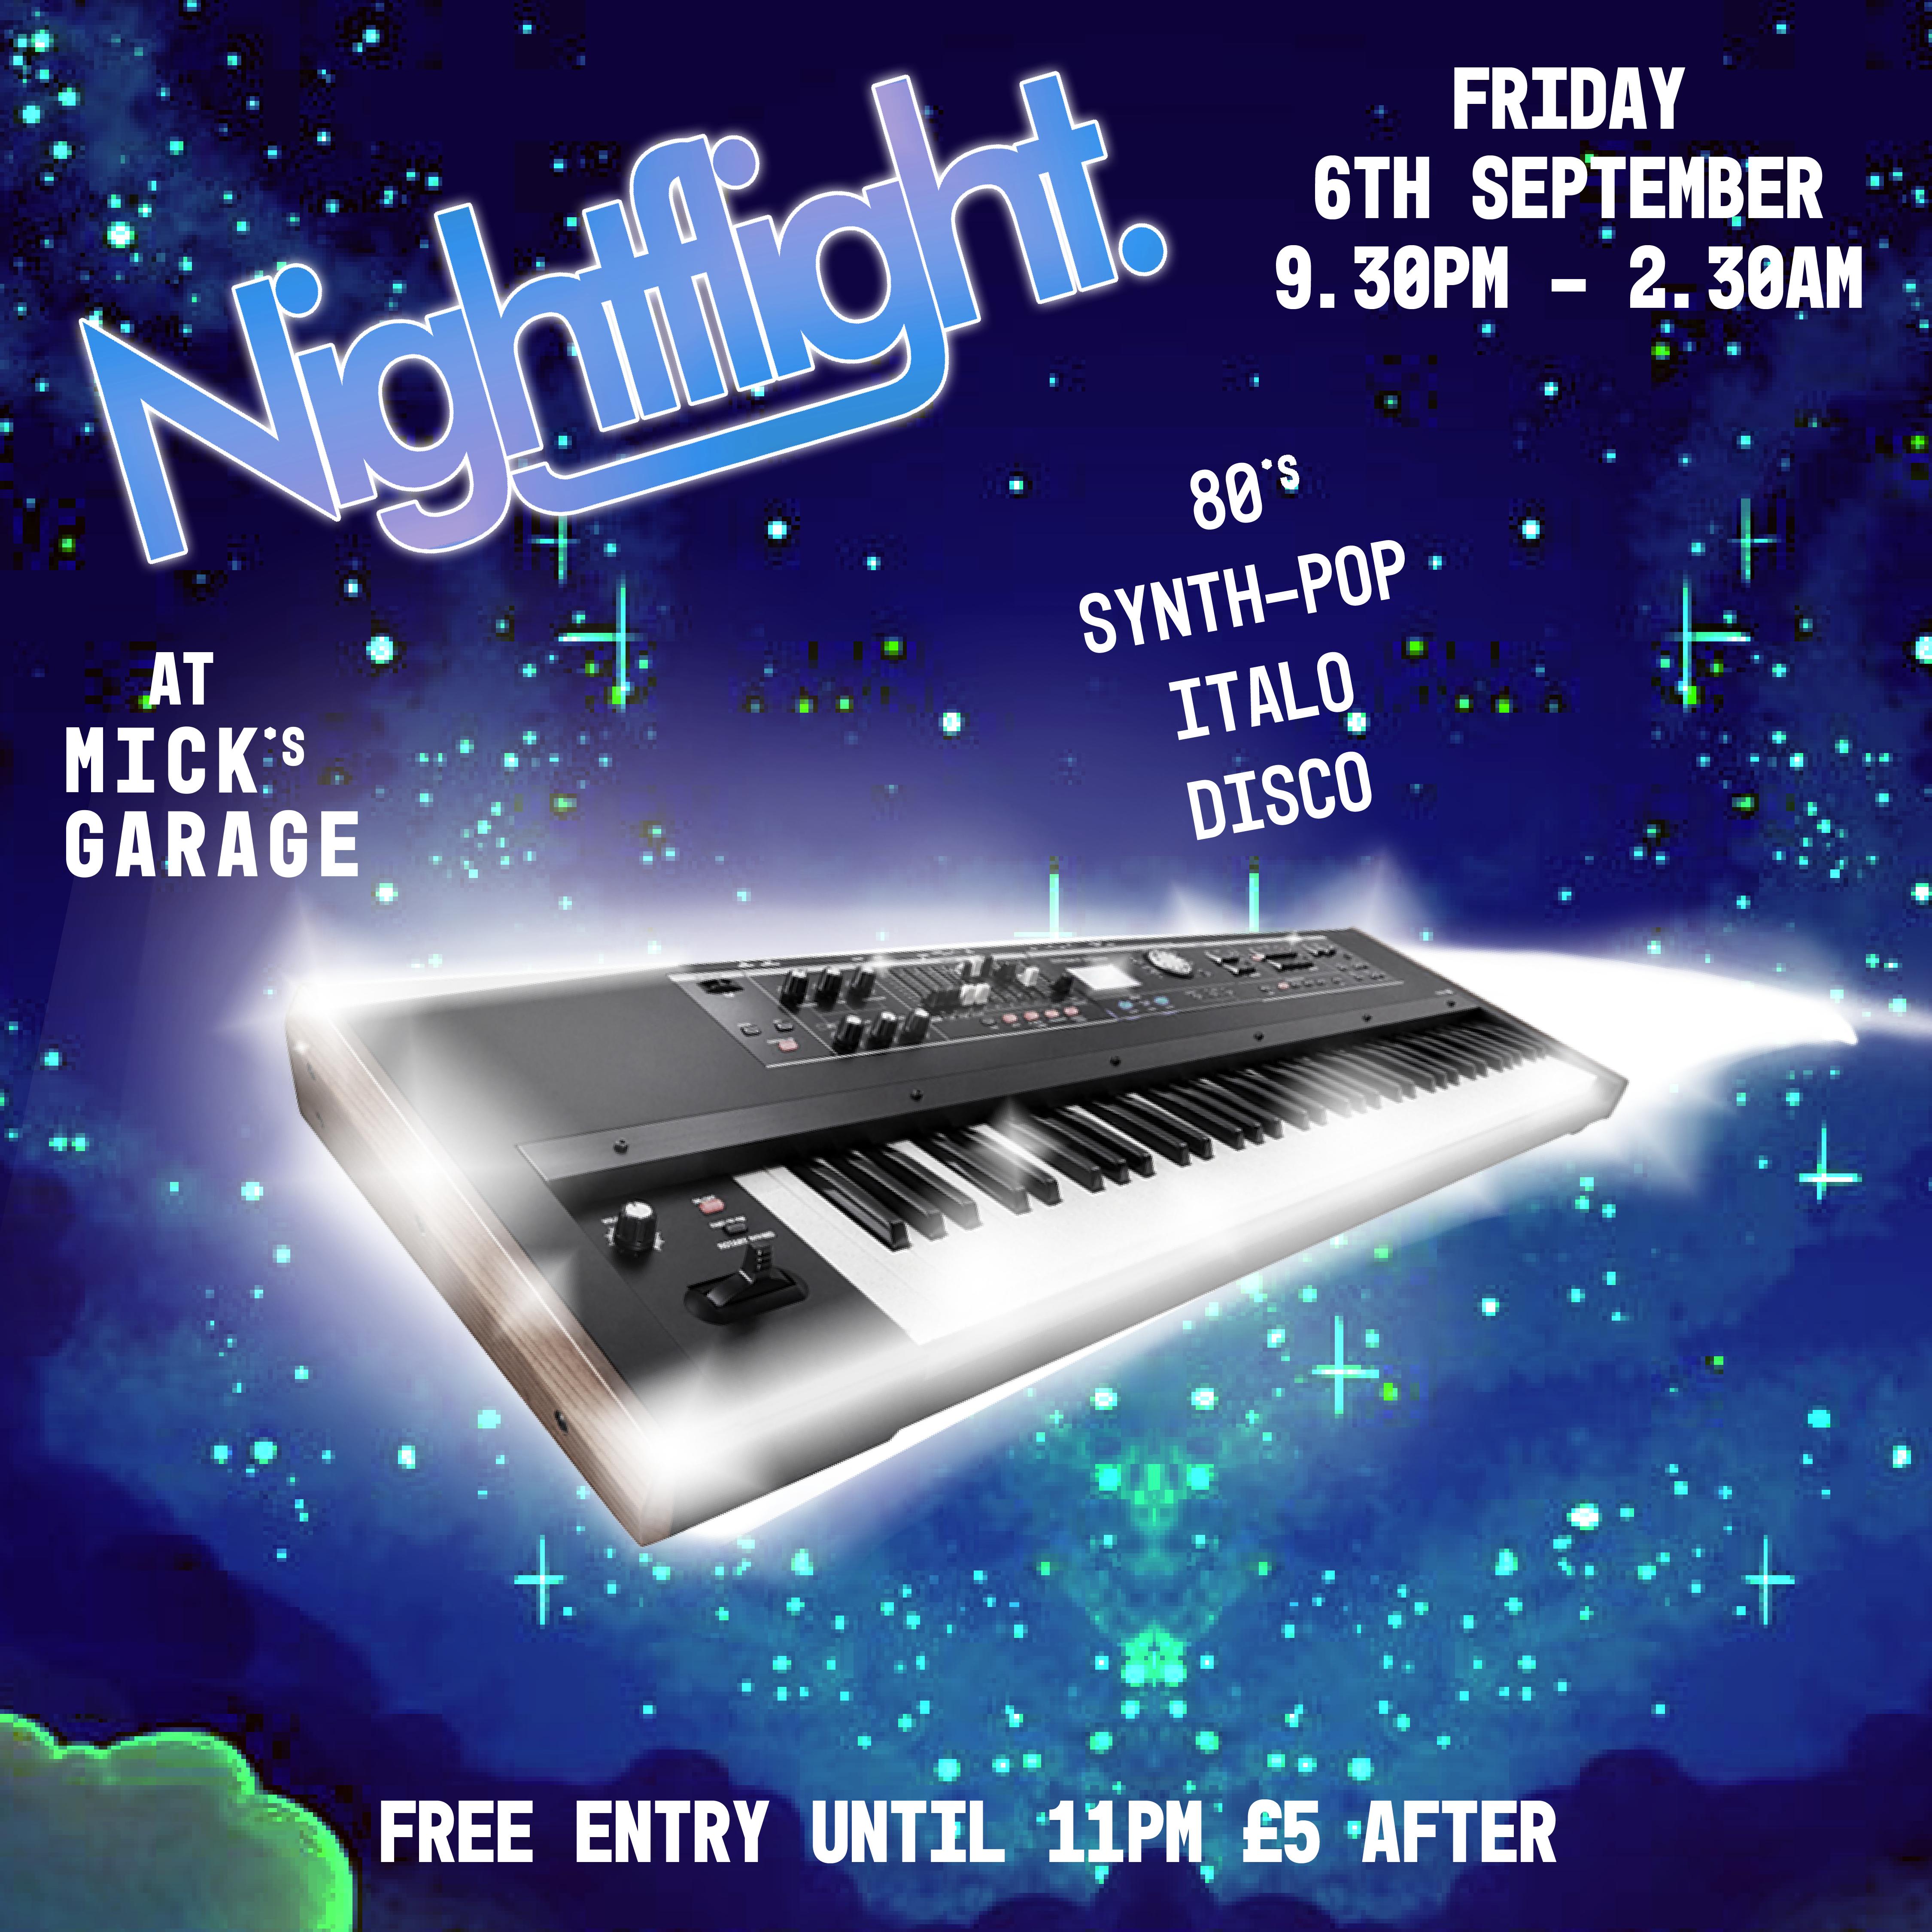 Nightflight: 80's, Synth-Pop, Italo, Disco at Mick's Garage